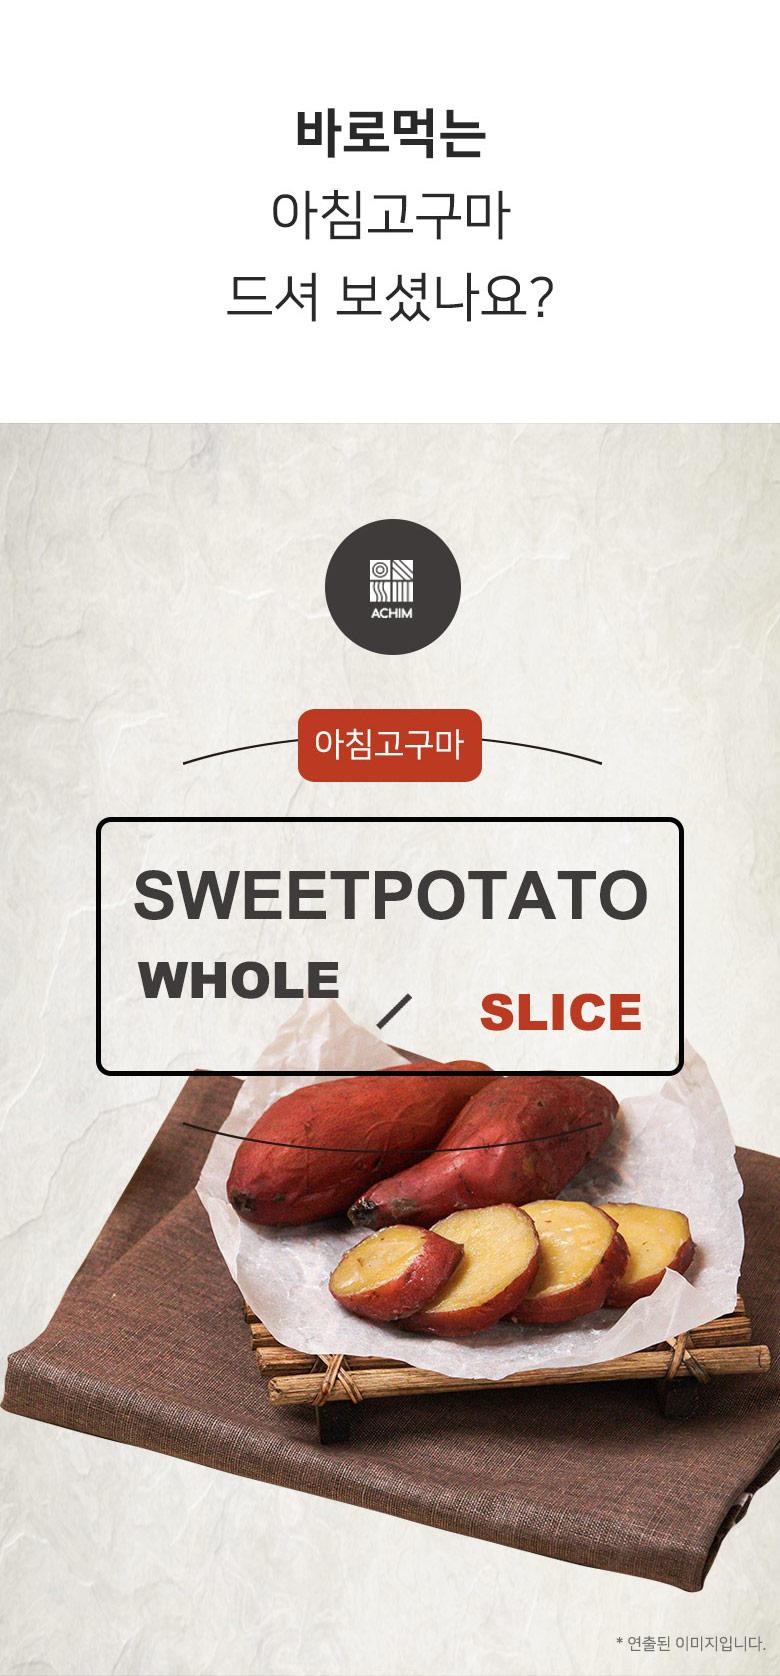 achim_sweetpotato_slice_02_shop1_175021.jpg